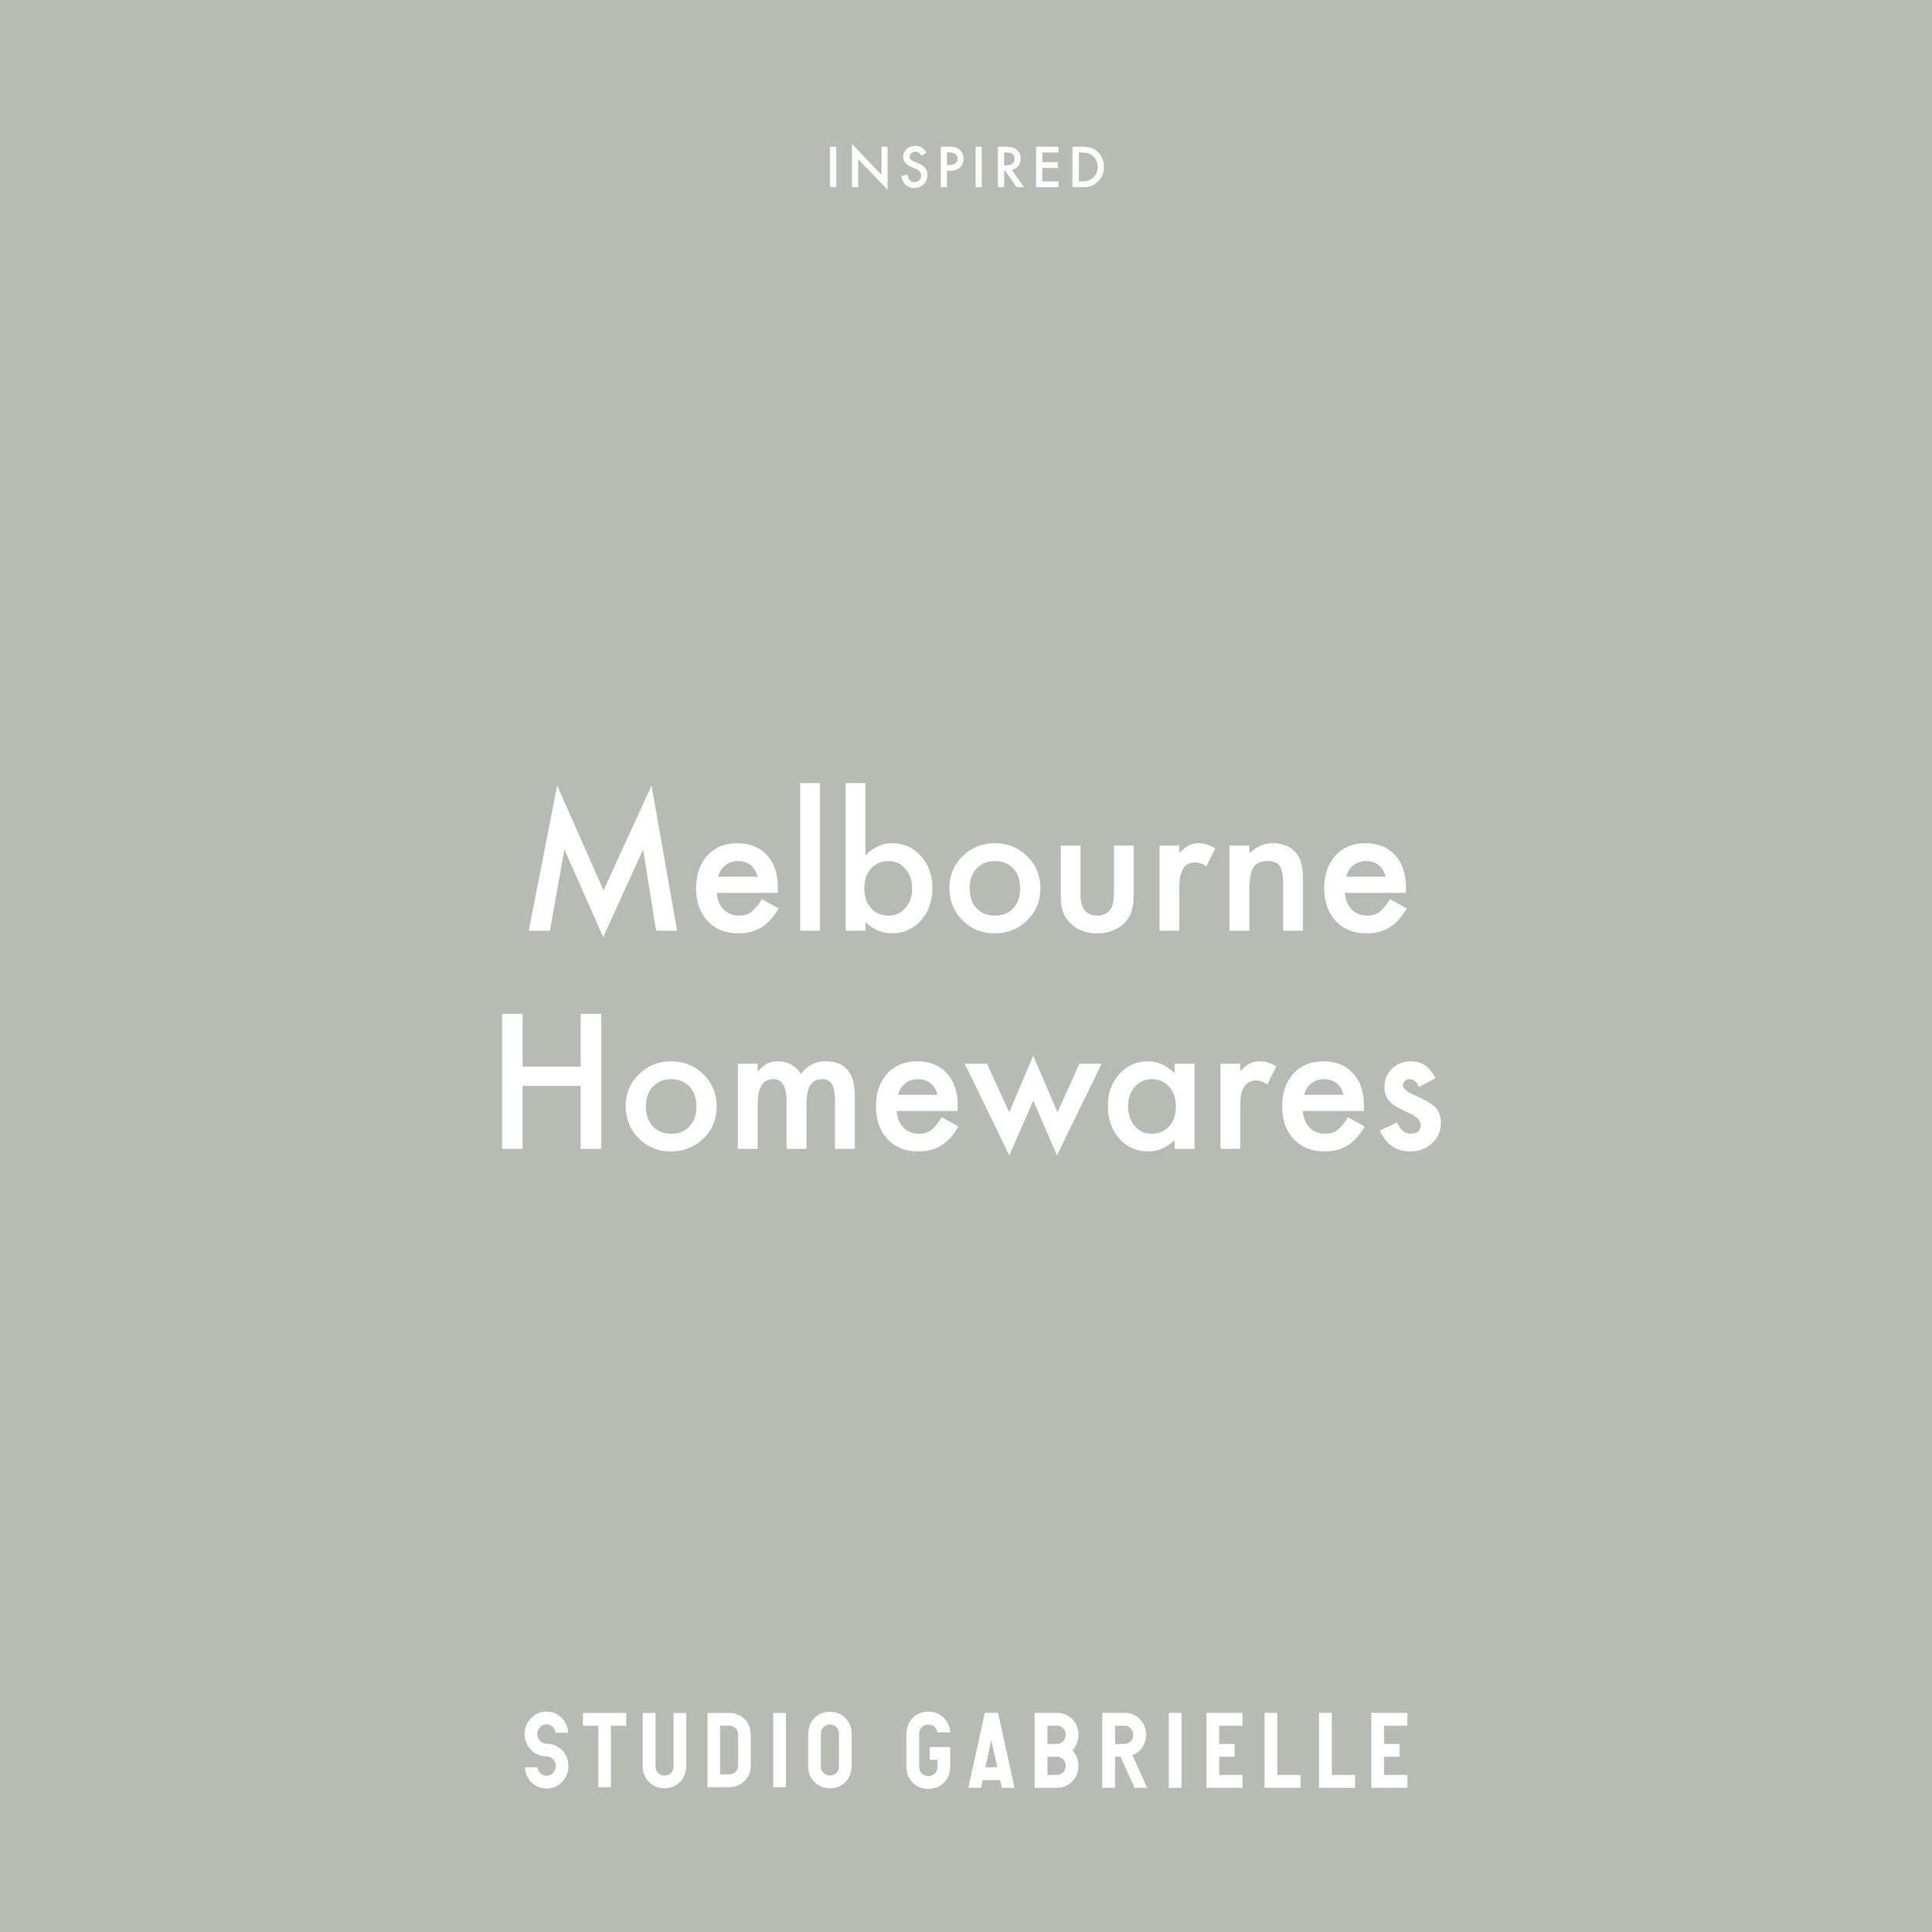 StudioGabrielle-Inspired-Melbourne-Homewares-studiogabrielle.co.uk